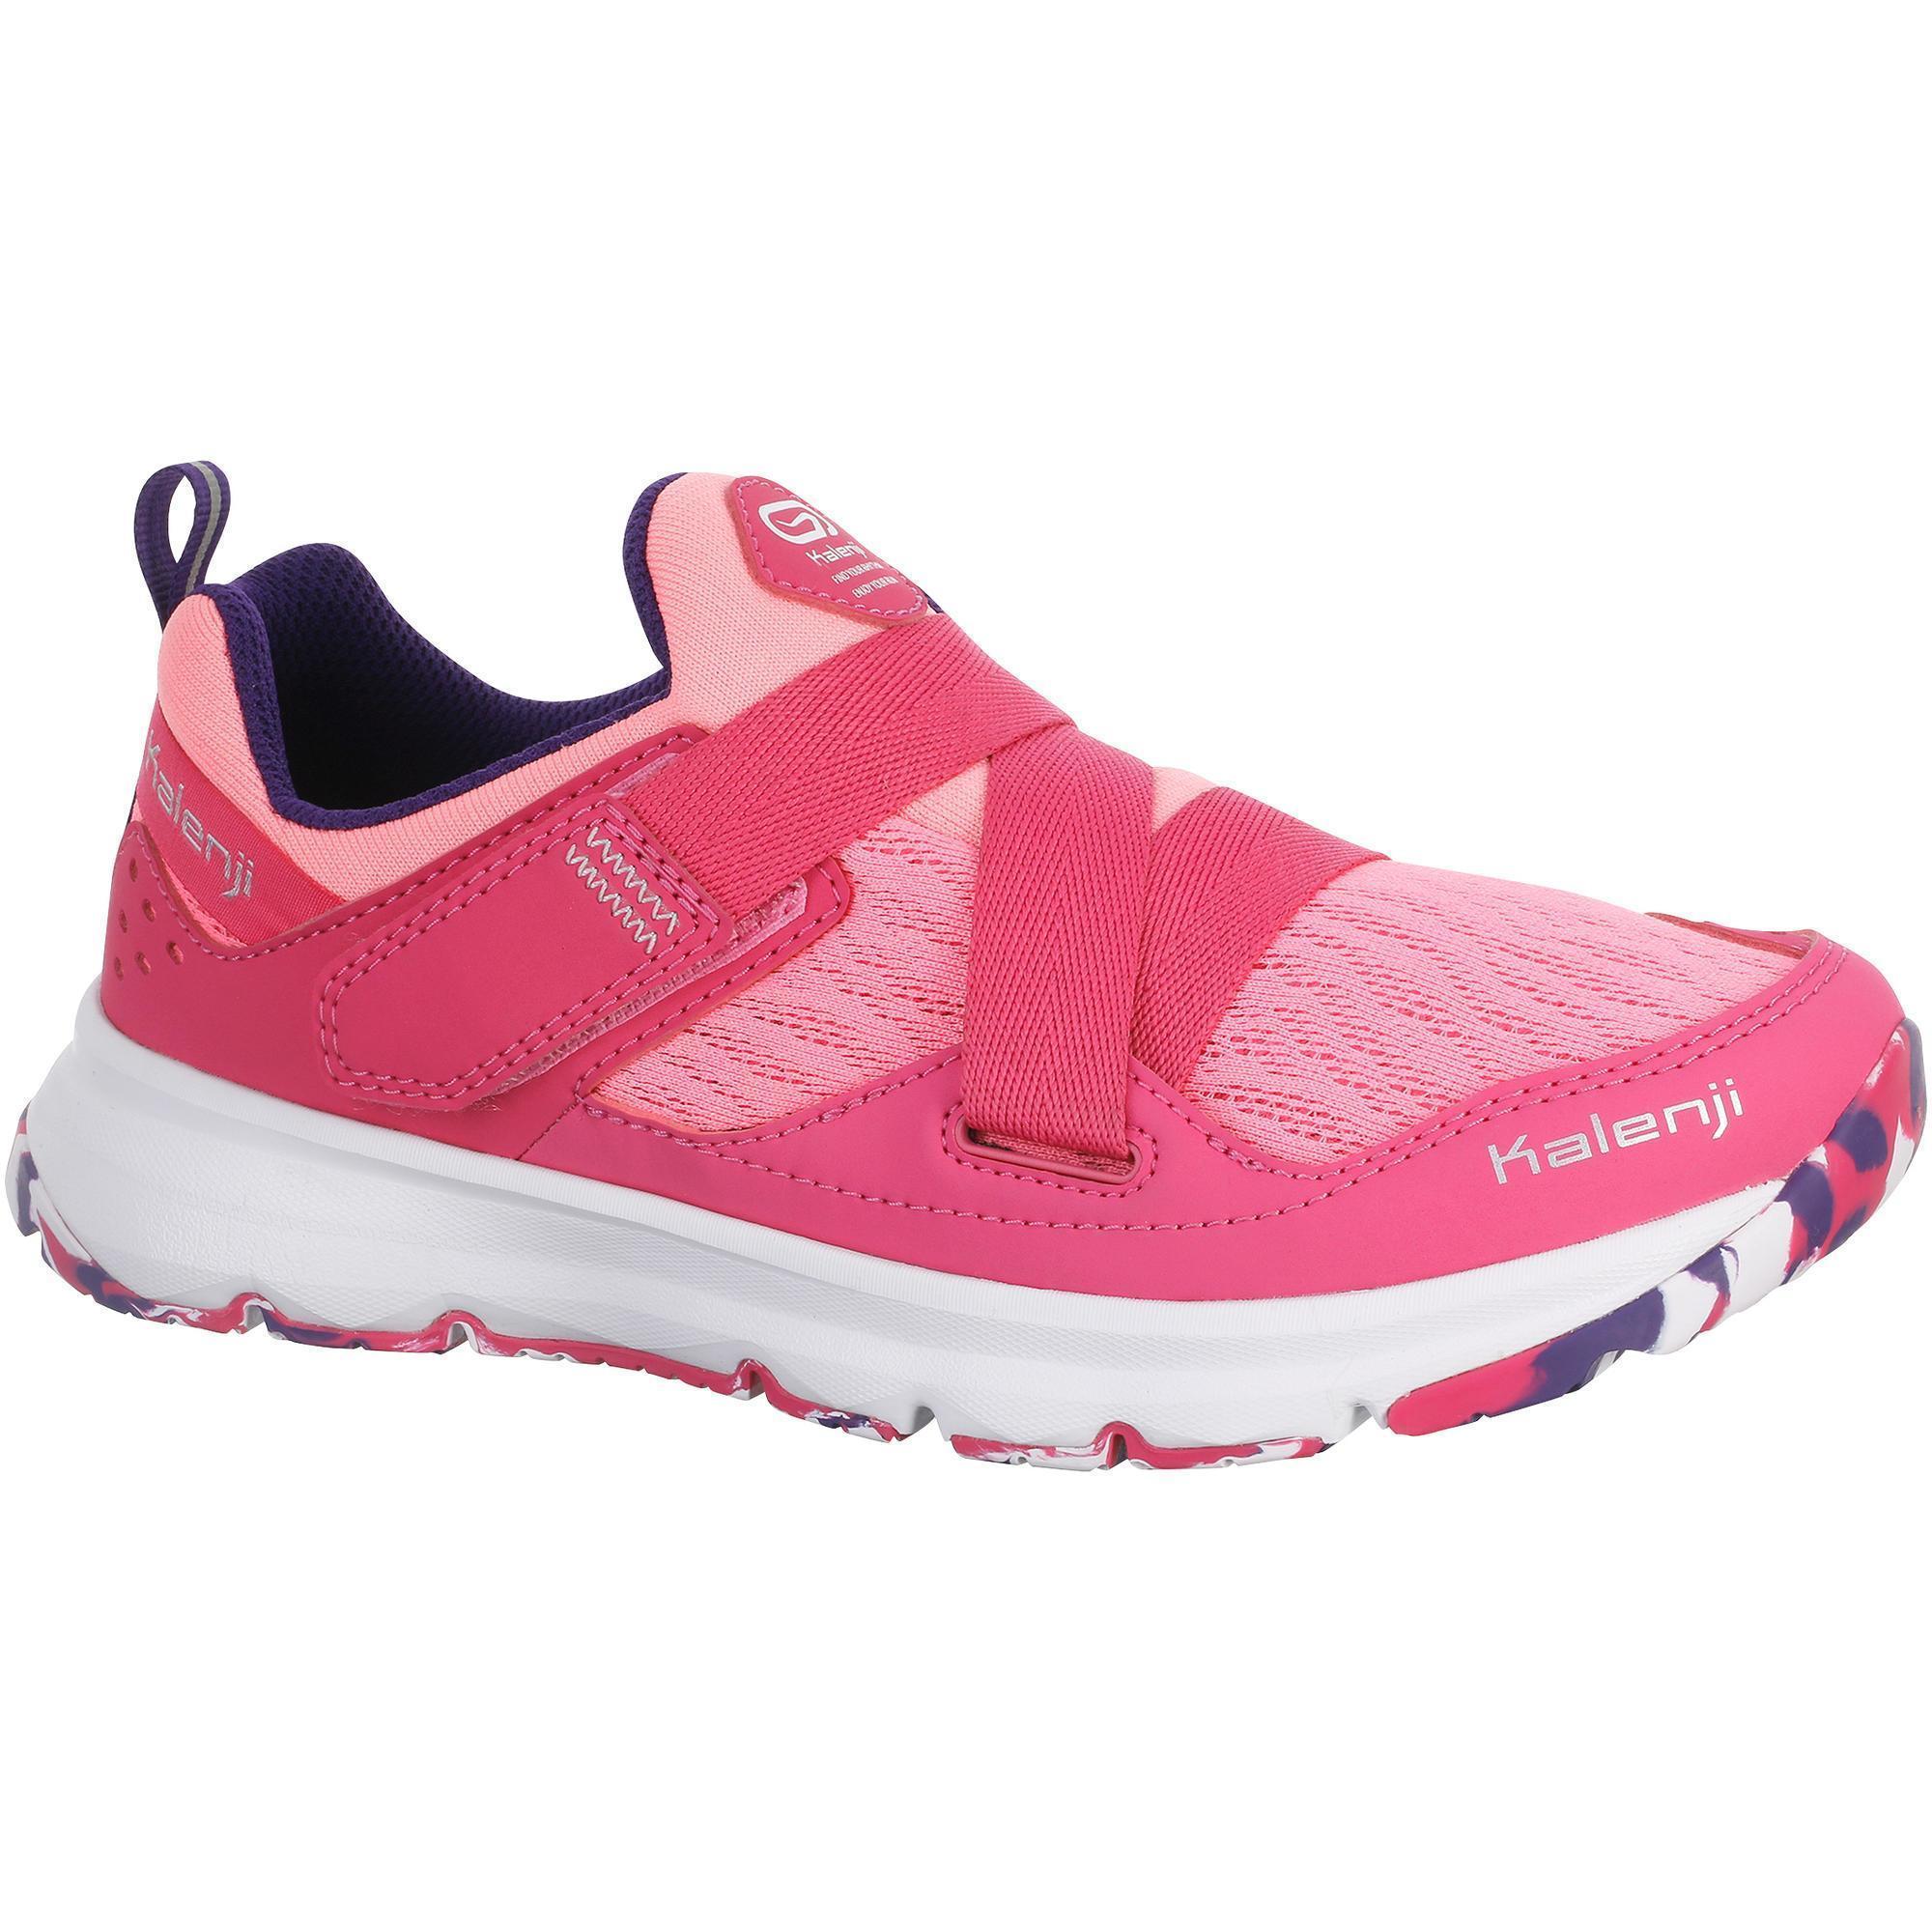 Chaussure running fille eliofeet fluo rose kalenji - Chaussure enfant decathlon ...